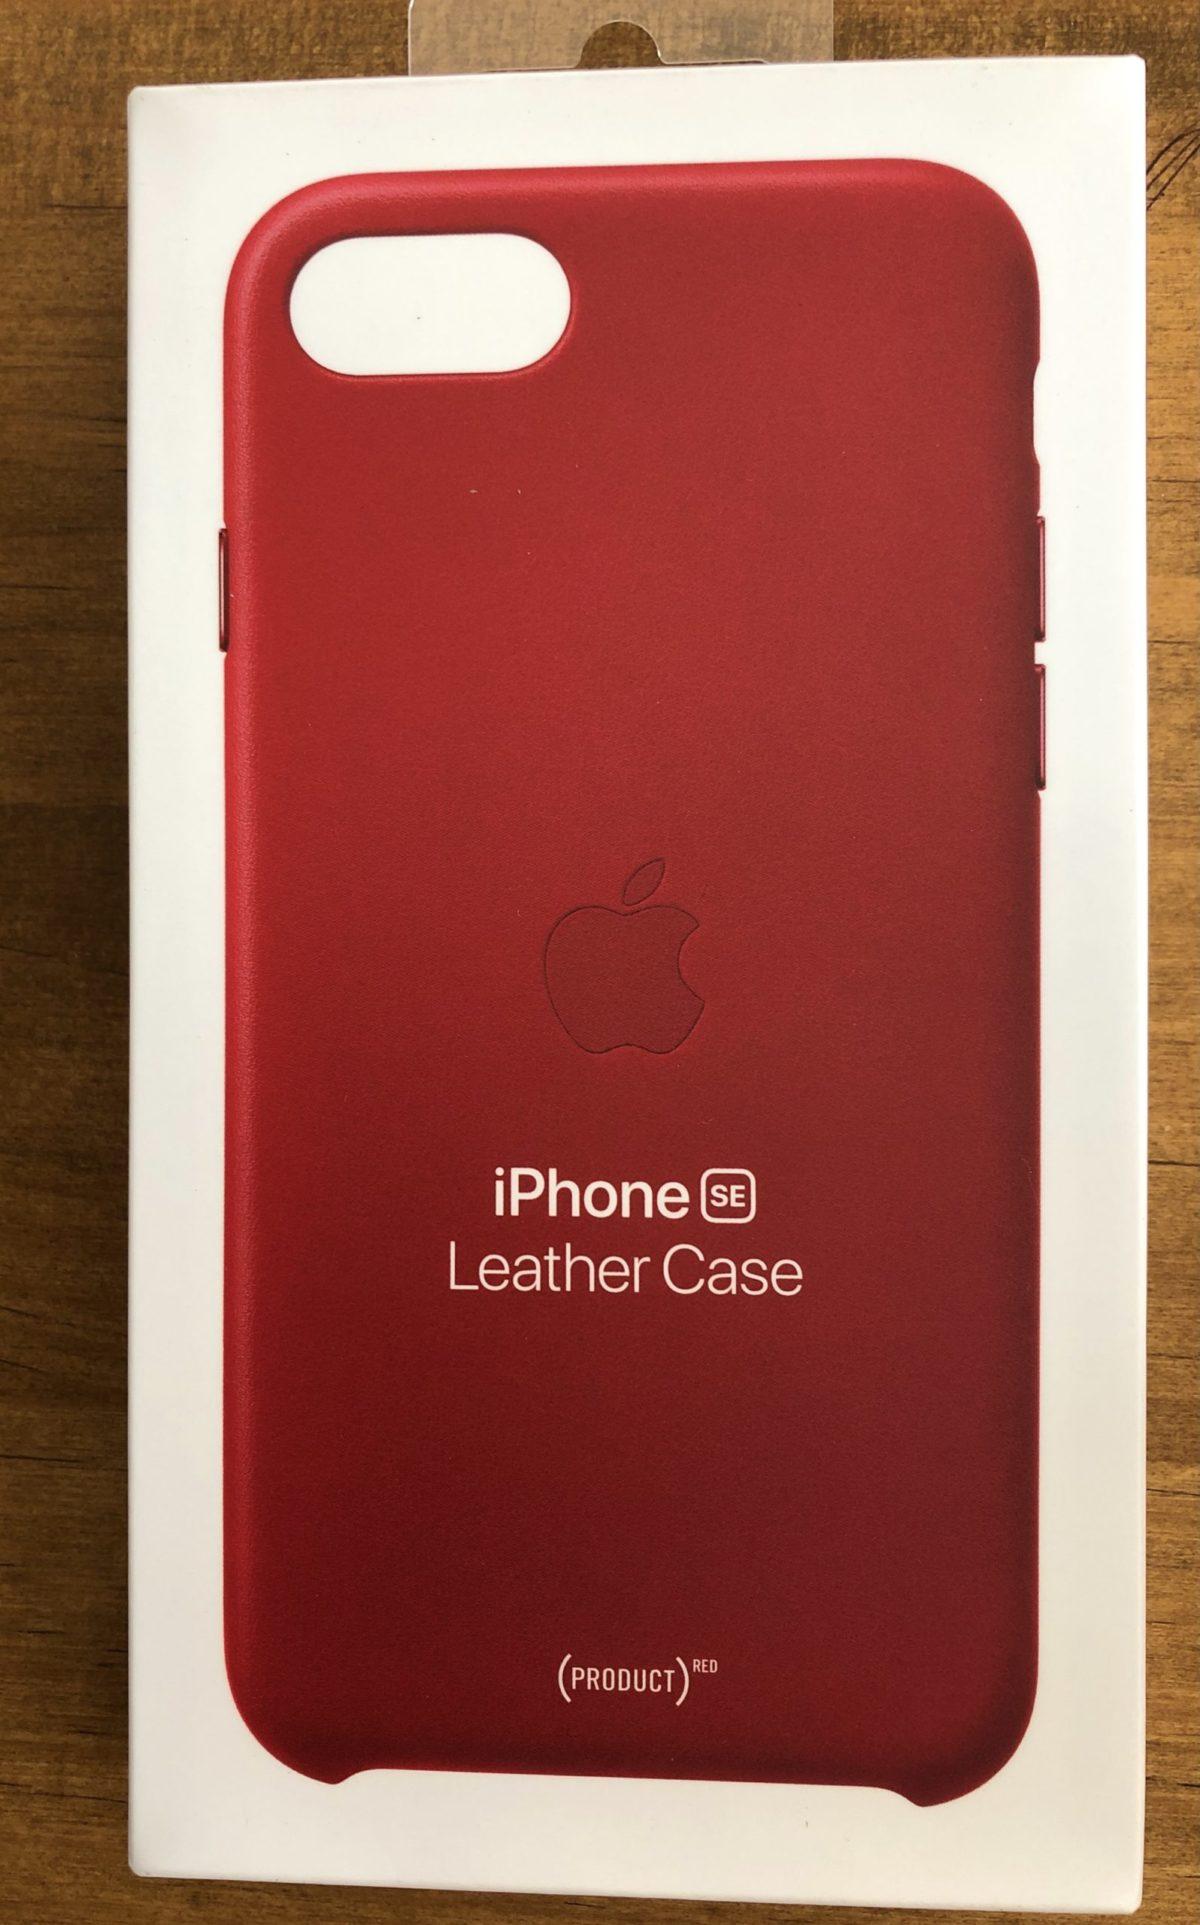 iPhone SE レザーケース PRODUCT(RED)外箱